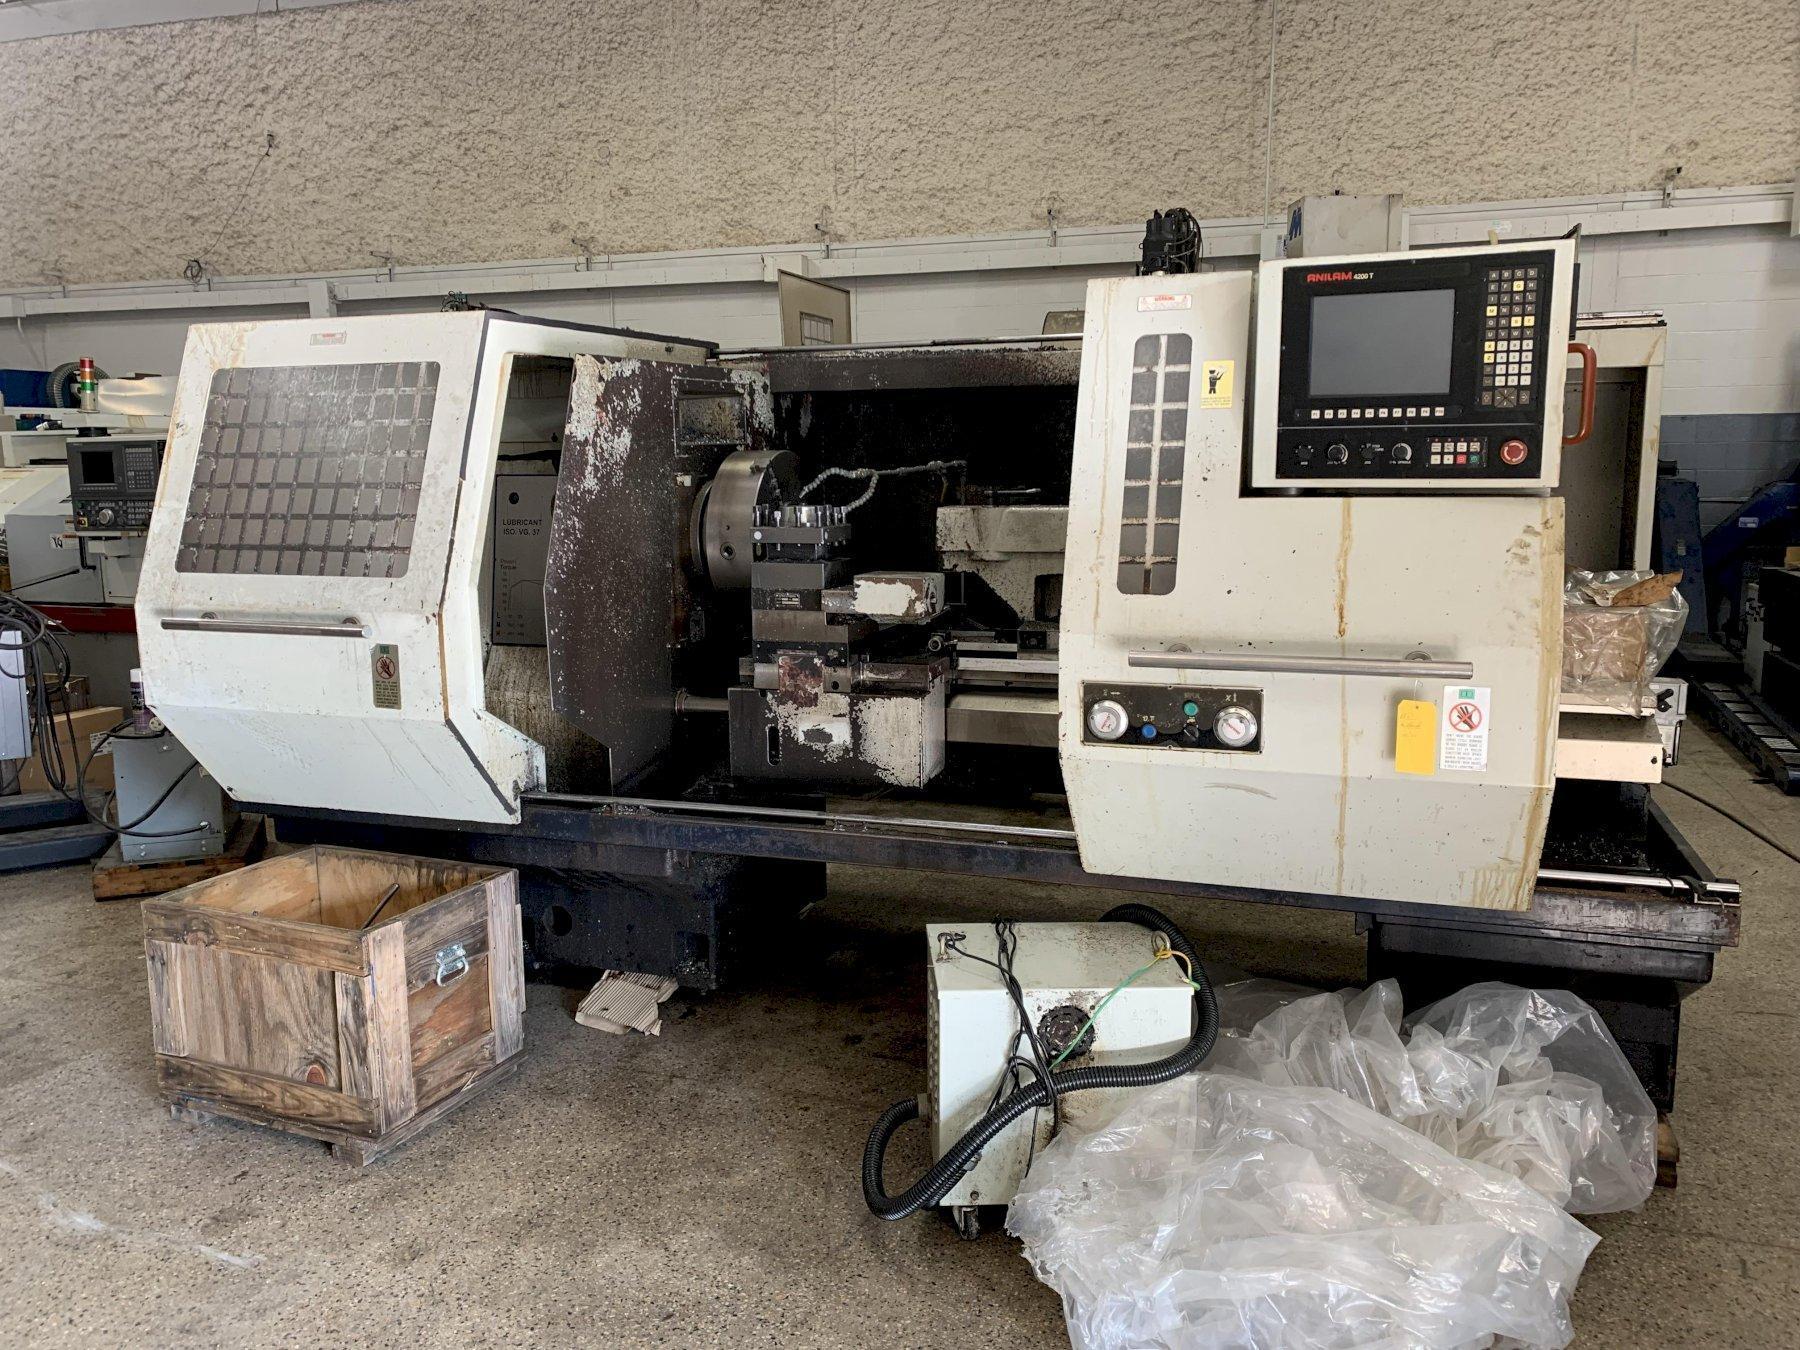 "26"" x 60"" WILLIS Model 2660ENC CNC Flat Bed Lathe, S/N 0017, New approx 2000."